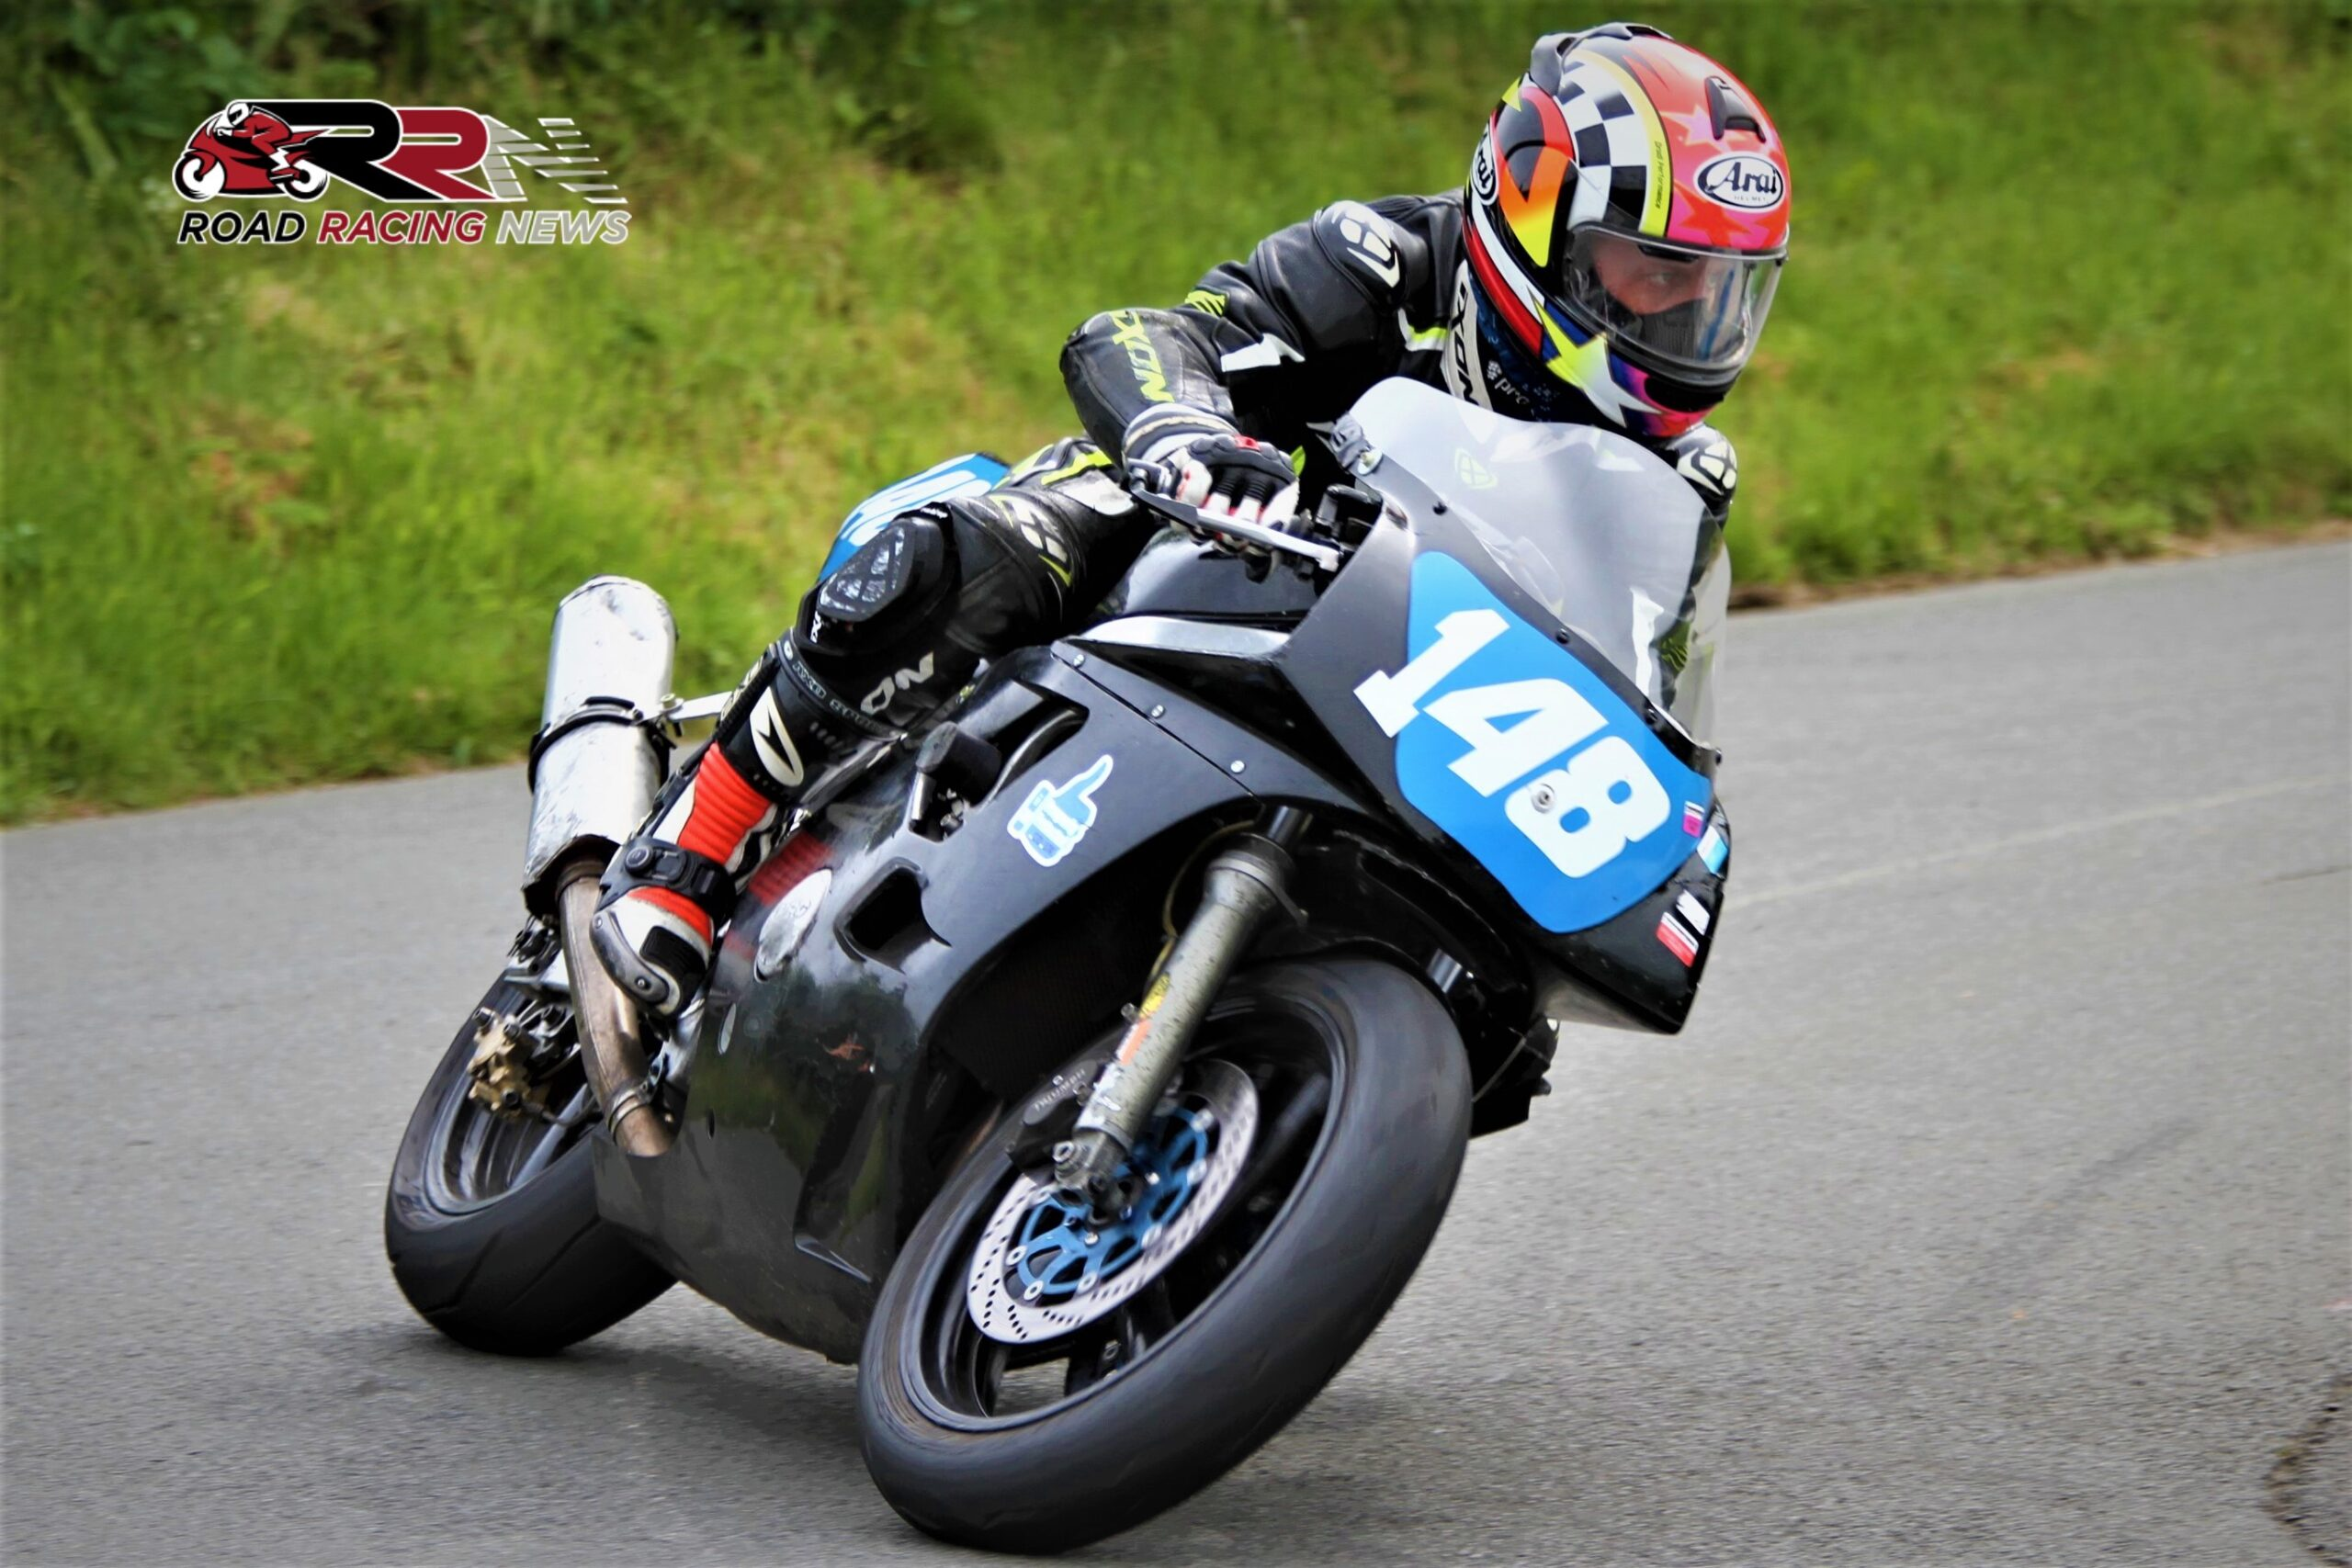 Road Racer's Adventures: BMCRC-MRO Championships, Snetterton